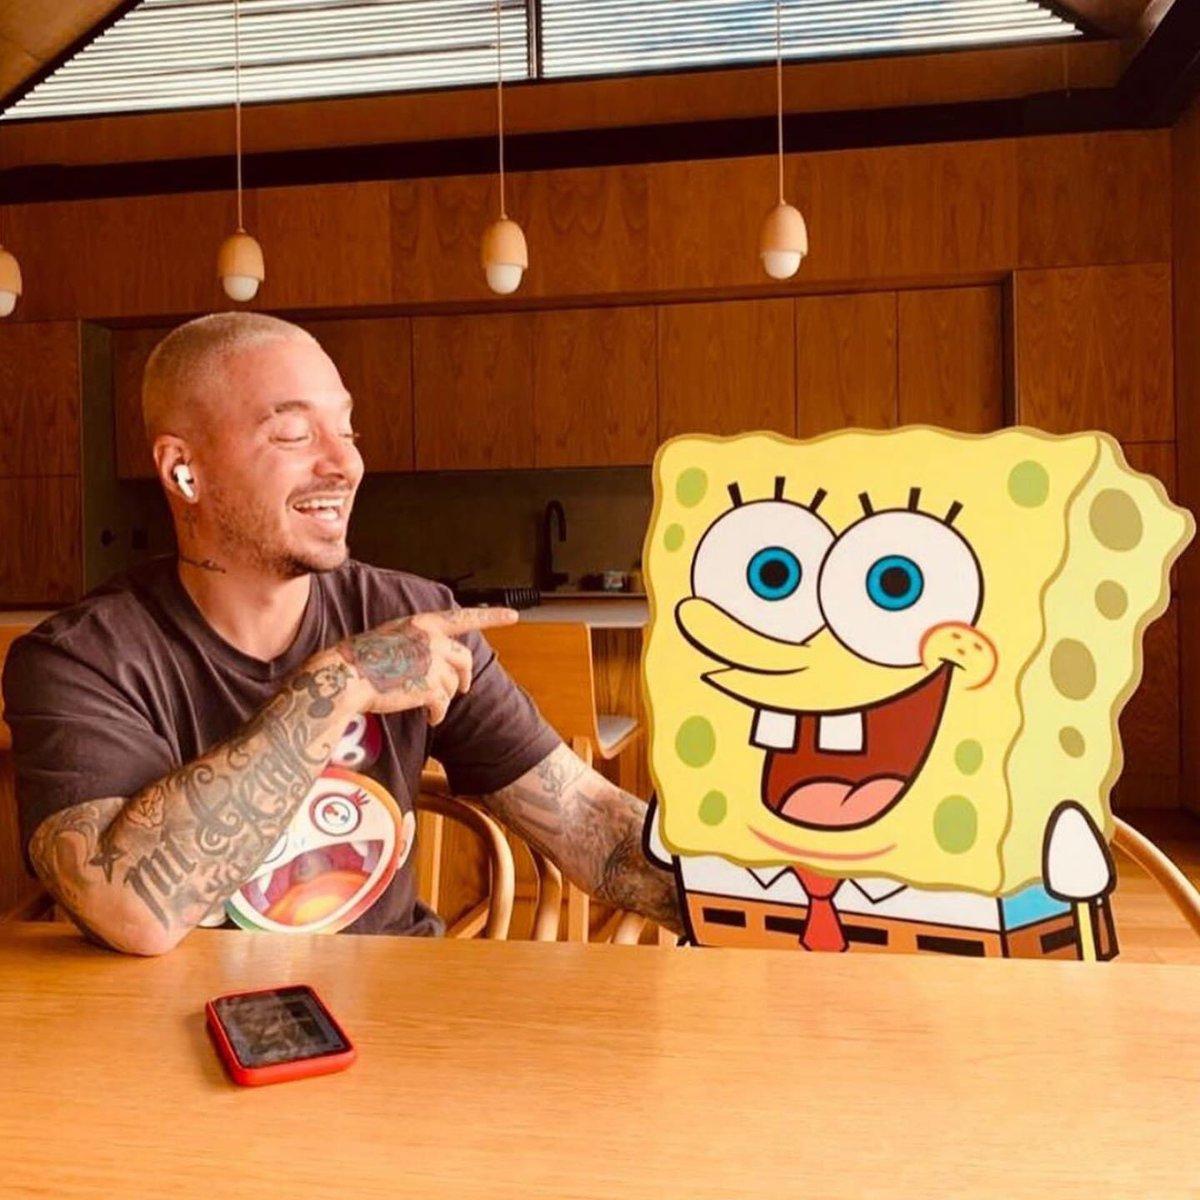 #AGUA - Jueves / Thursday #JBalvin @JBALVIN LatinoGANG@SpongeBobMovie  @Neon16_  @SpongeBob @ParamountPics @Nickelodeon @Tainypic.twitter.com/uzVaPEmkZM